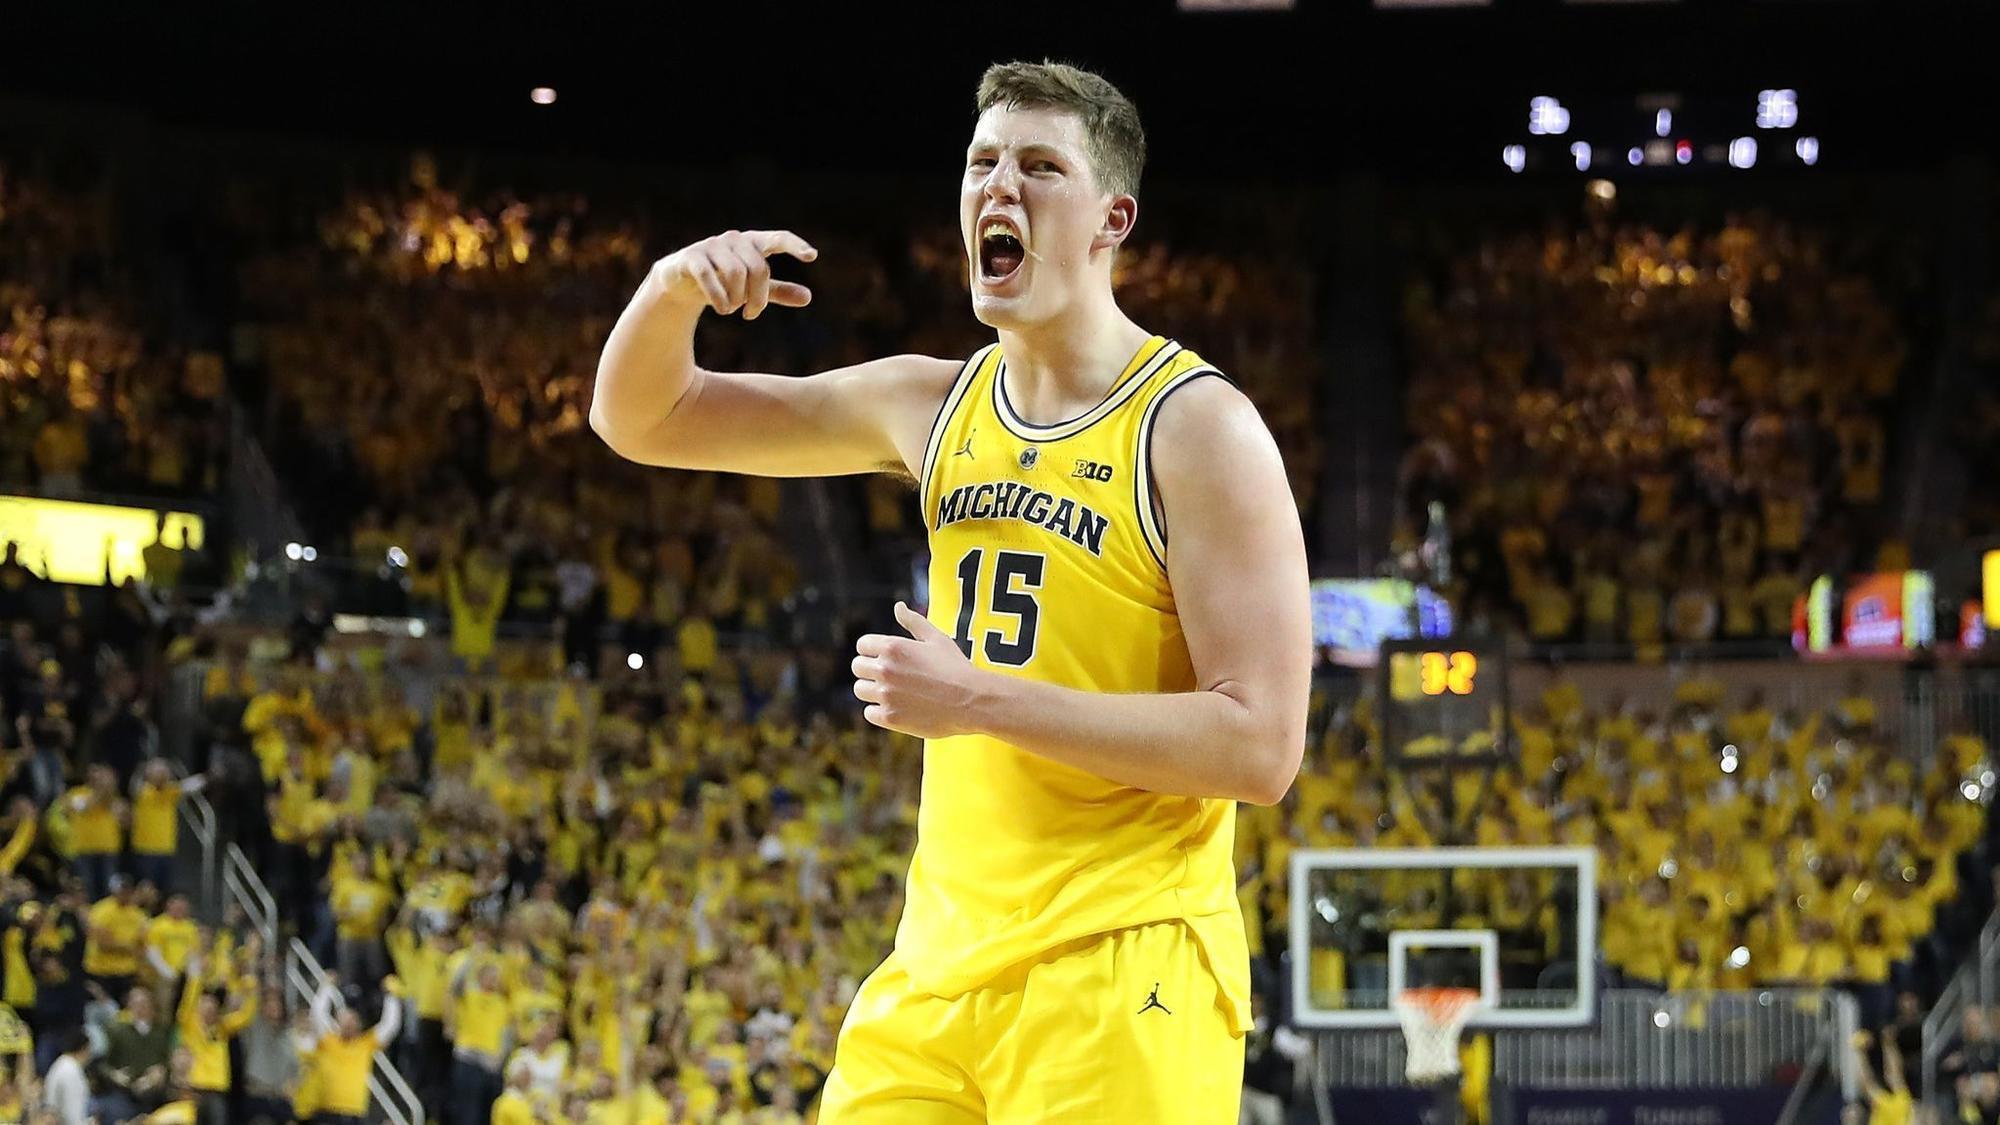 La-sp-college-basketball-20181128